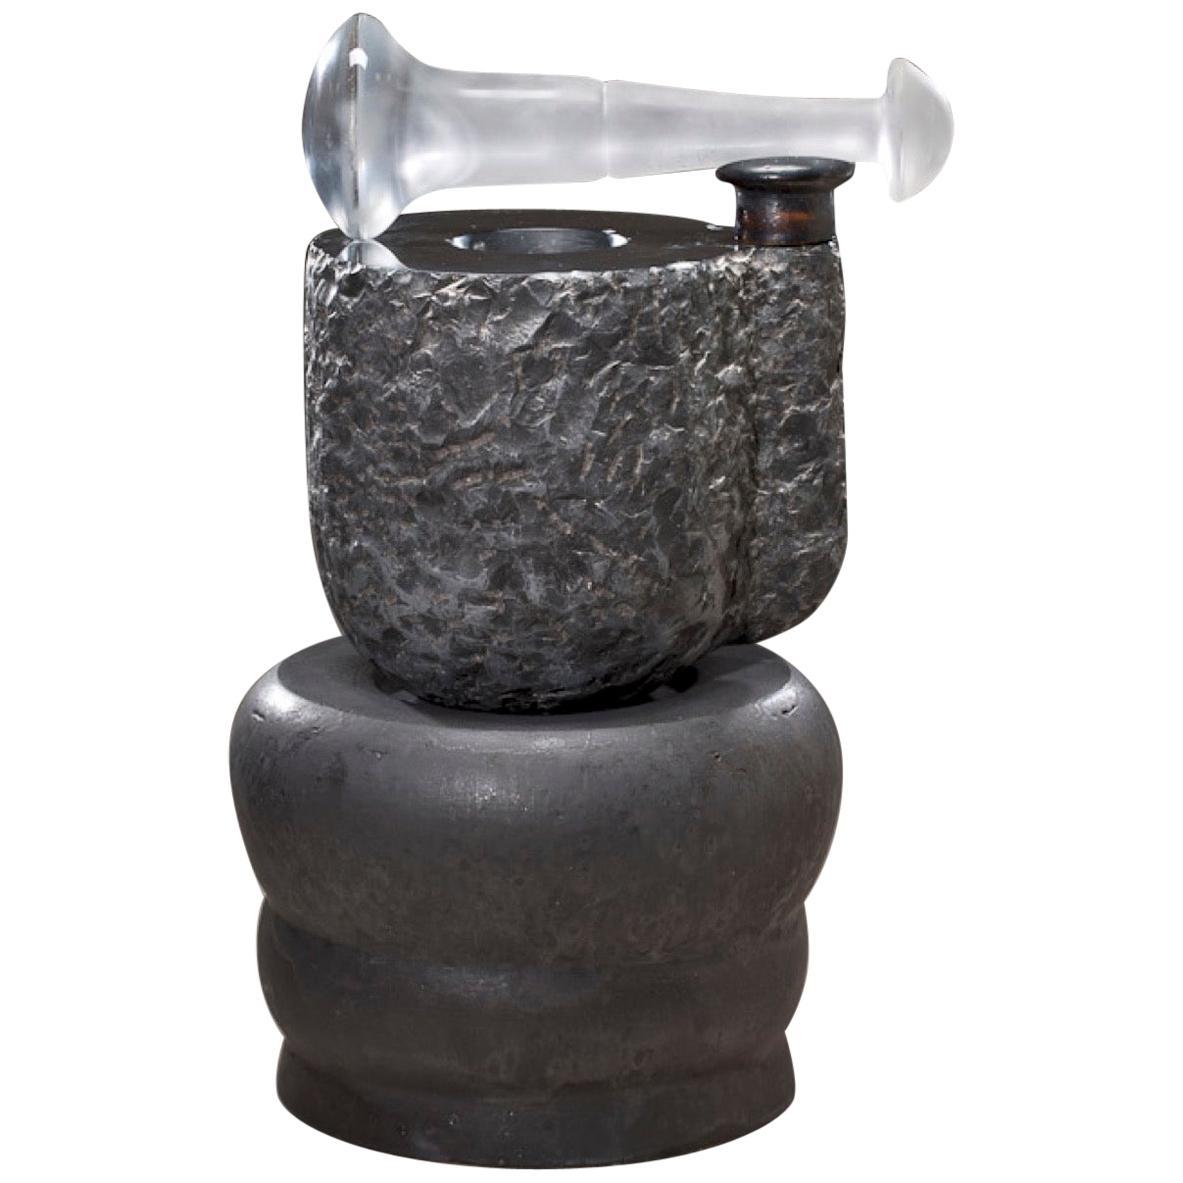 Richard Hirsch Black Marble Mortar and Glass Pestle Sculpture, circa 2006 - 2010